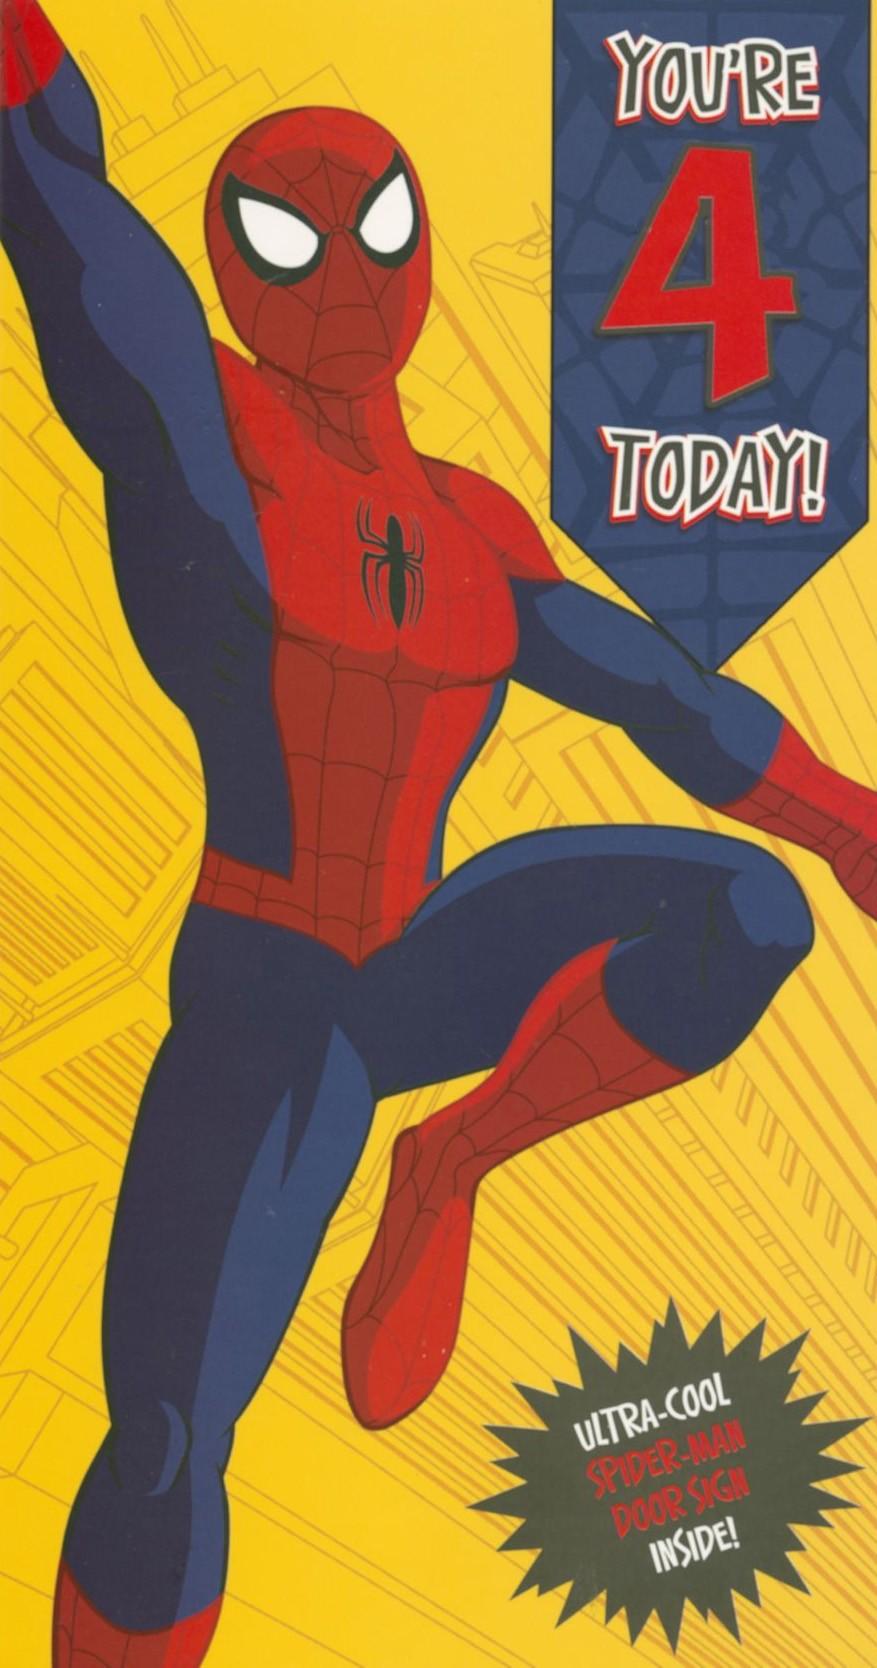 87 Home, Furniture & DIY Spiderman Card with Badge GRANDSON BIRTHDAY ...